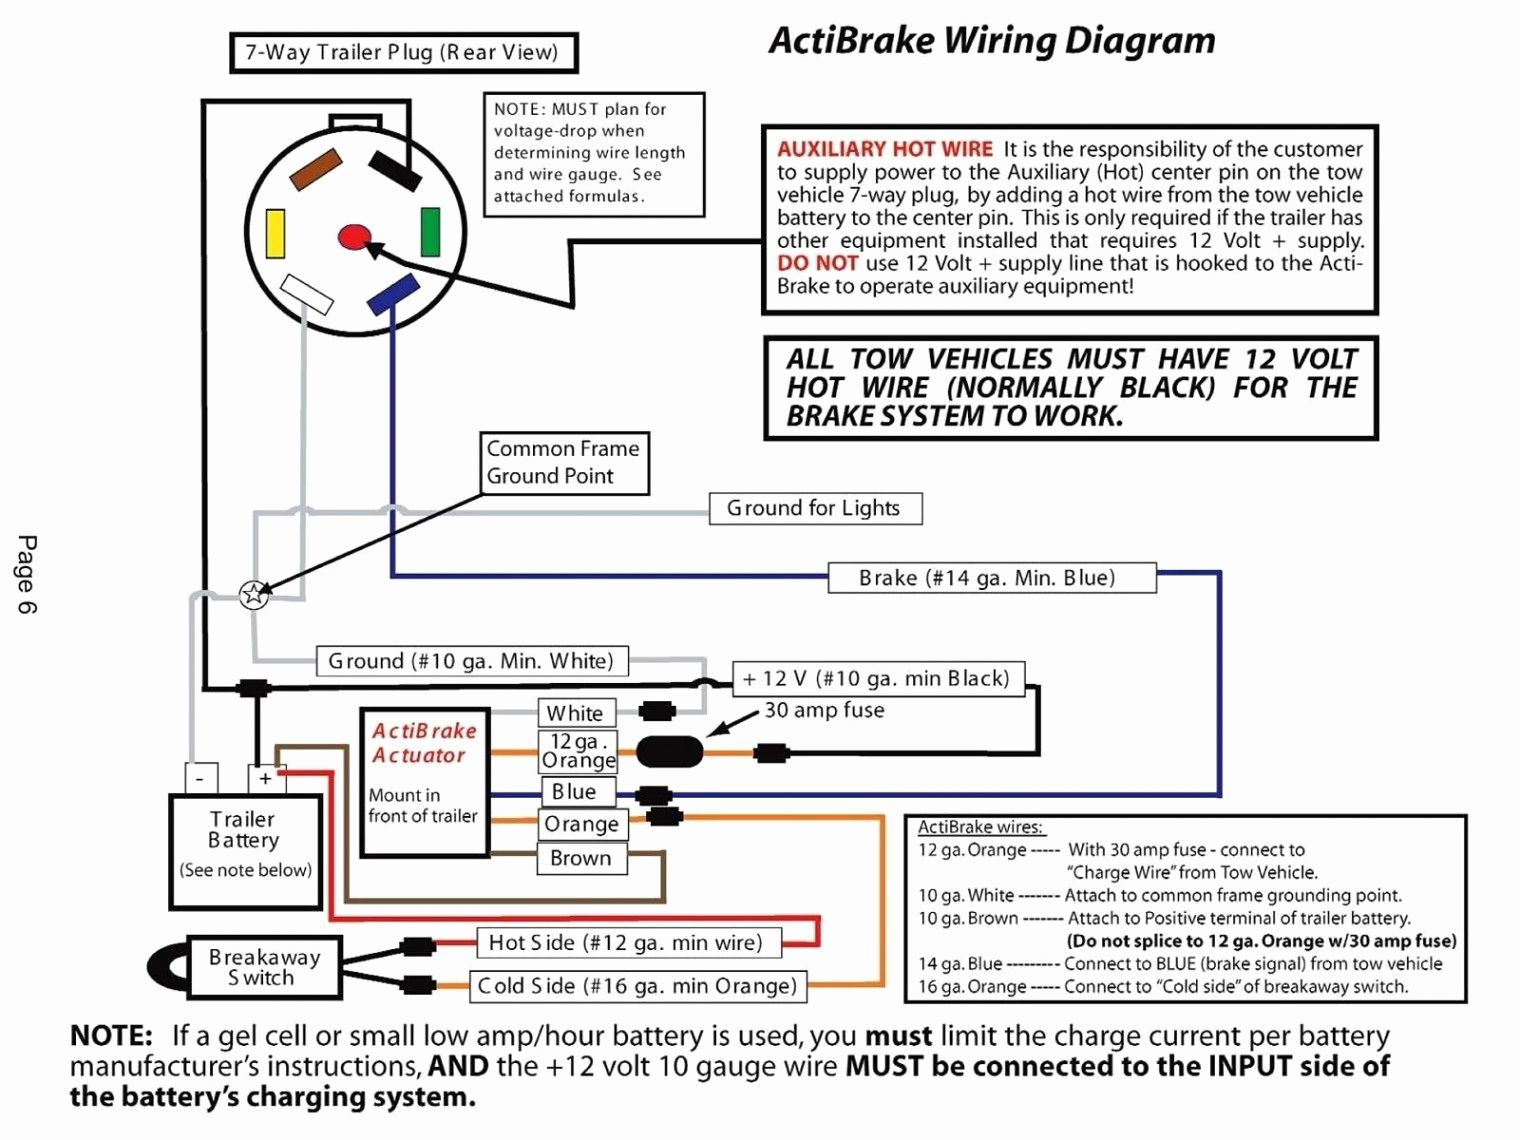 Pollak Trailer Plug Wiring Diagram 7   Manual E-Books - Pollak Trailer Plug Wiring Diagram